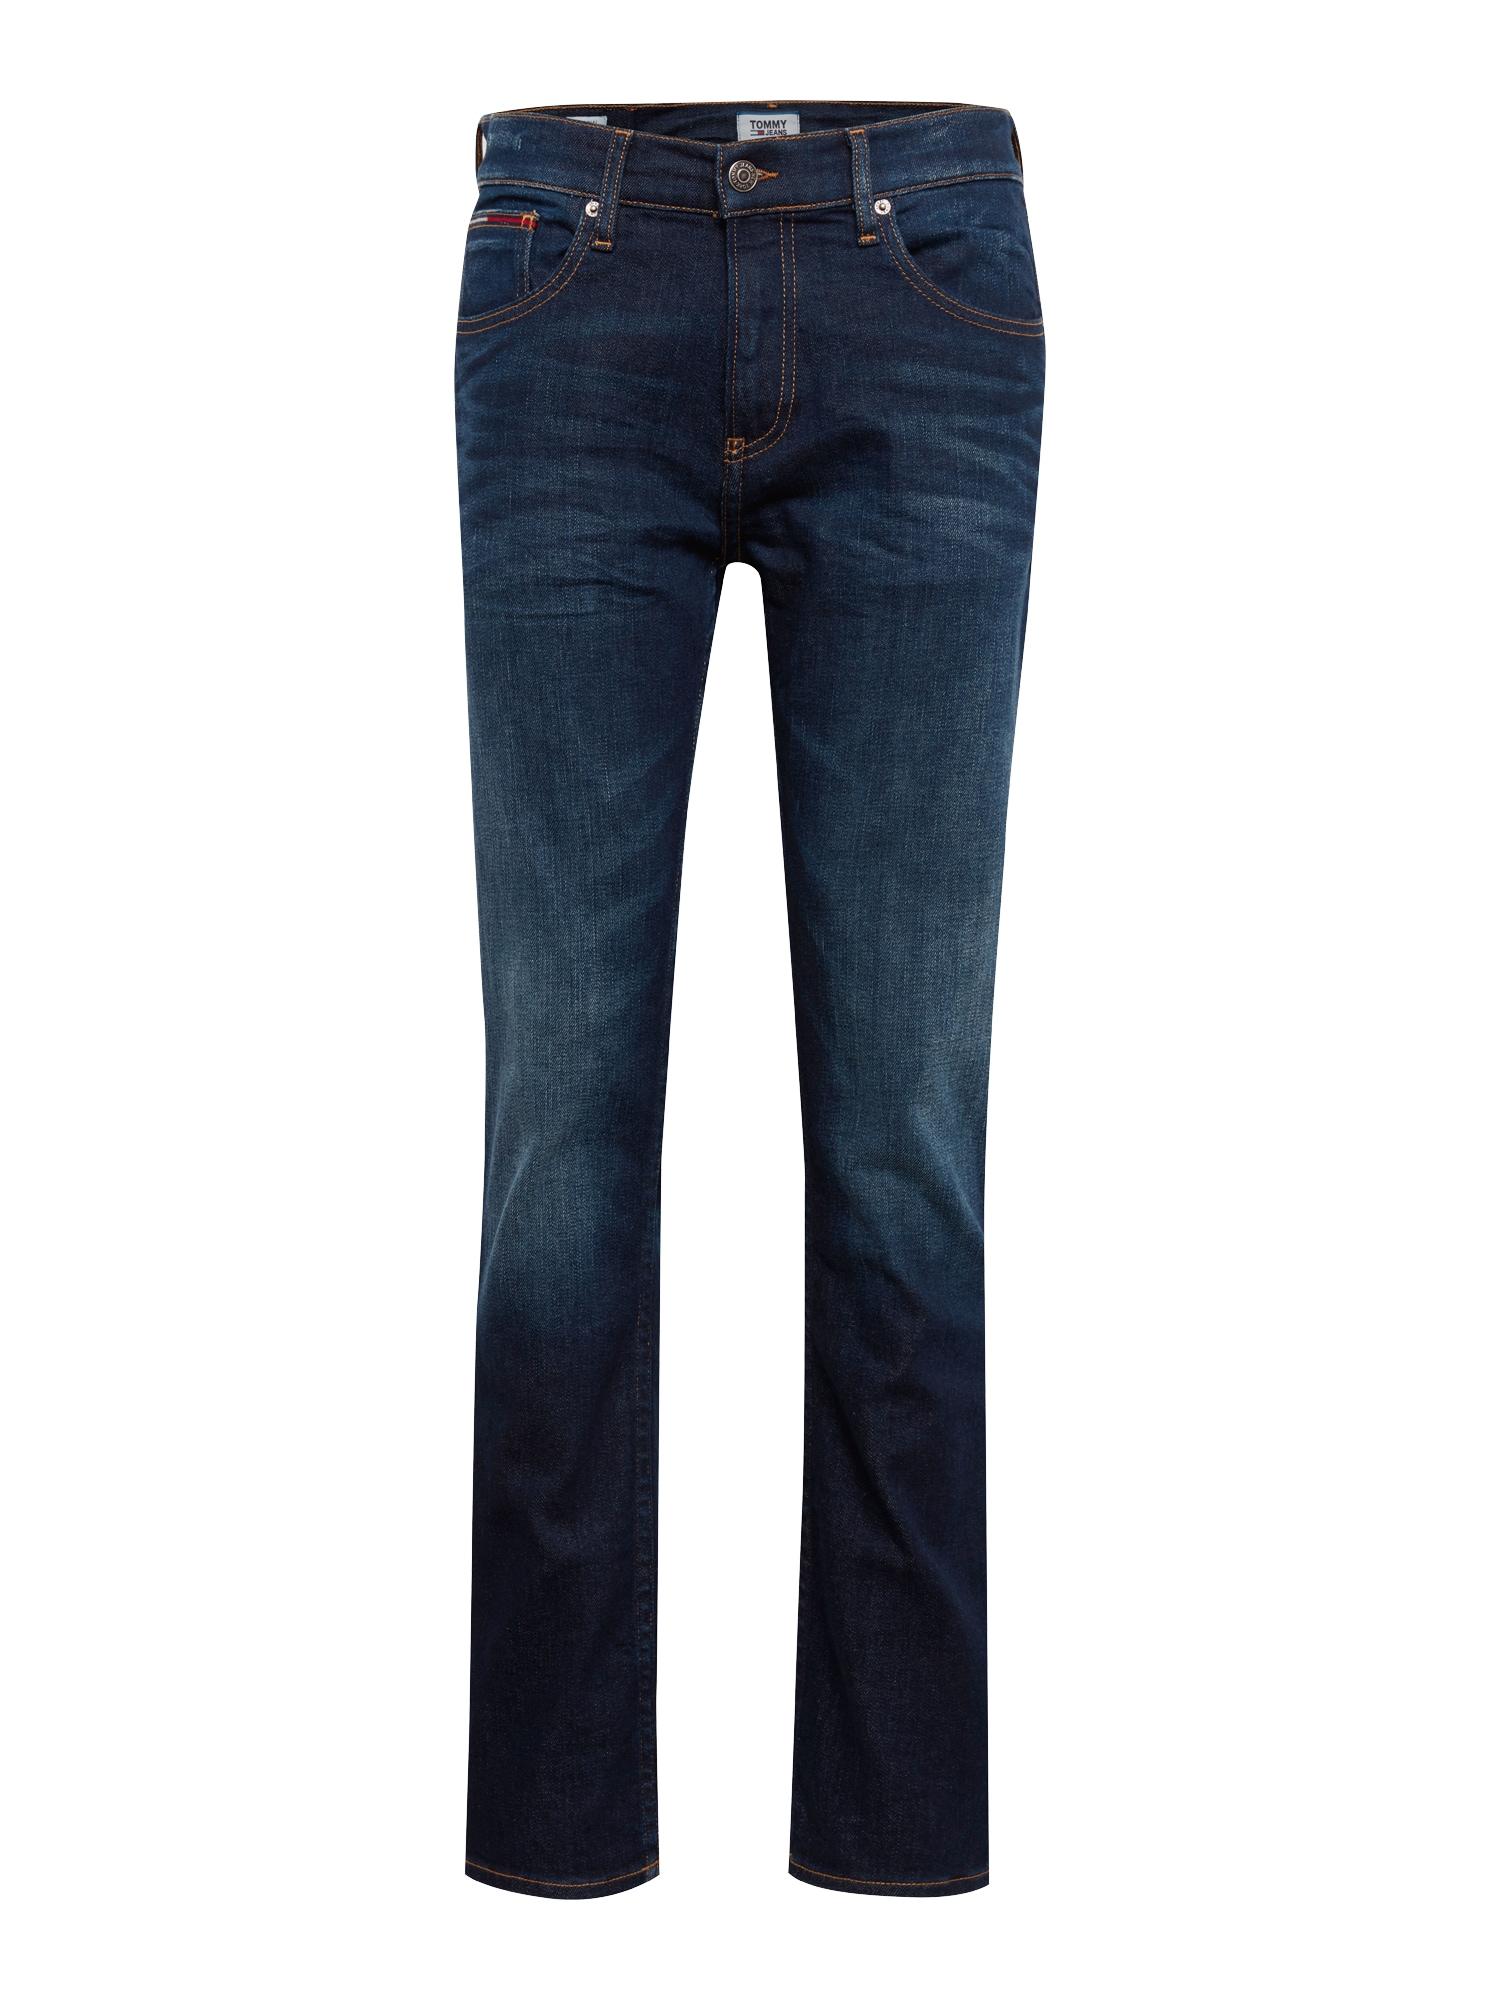 Tommy Jeans Džinsai 'Original Straight Ryan DACO' tamsiai (džinso) mėlyna